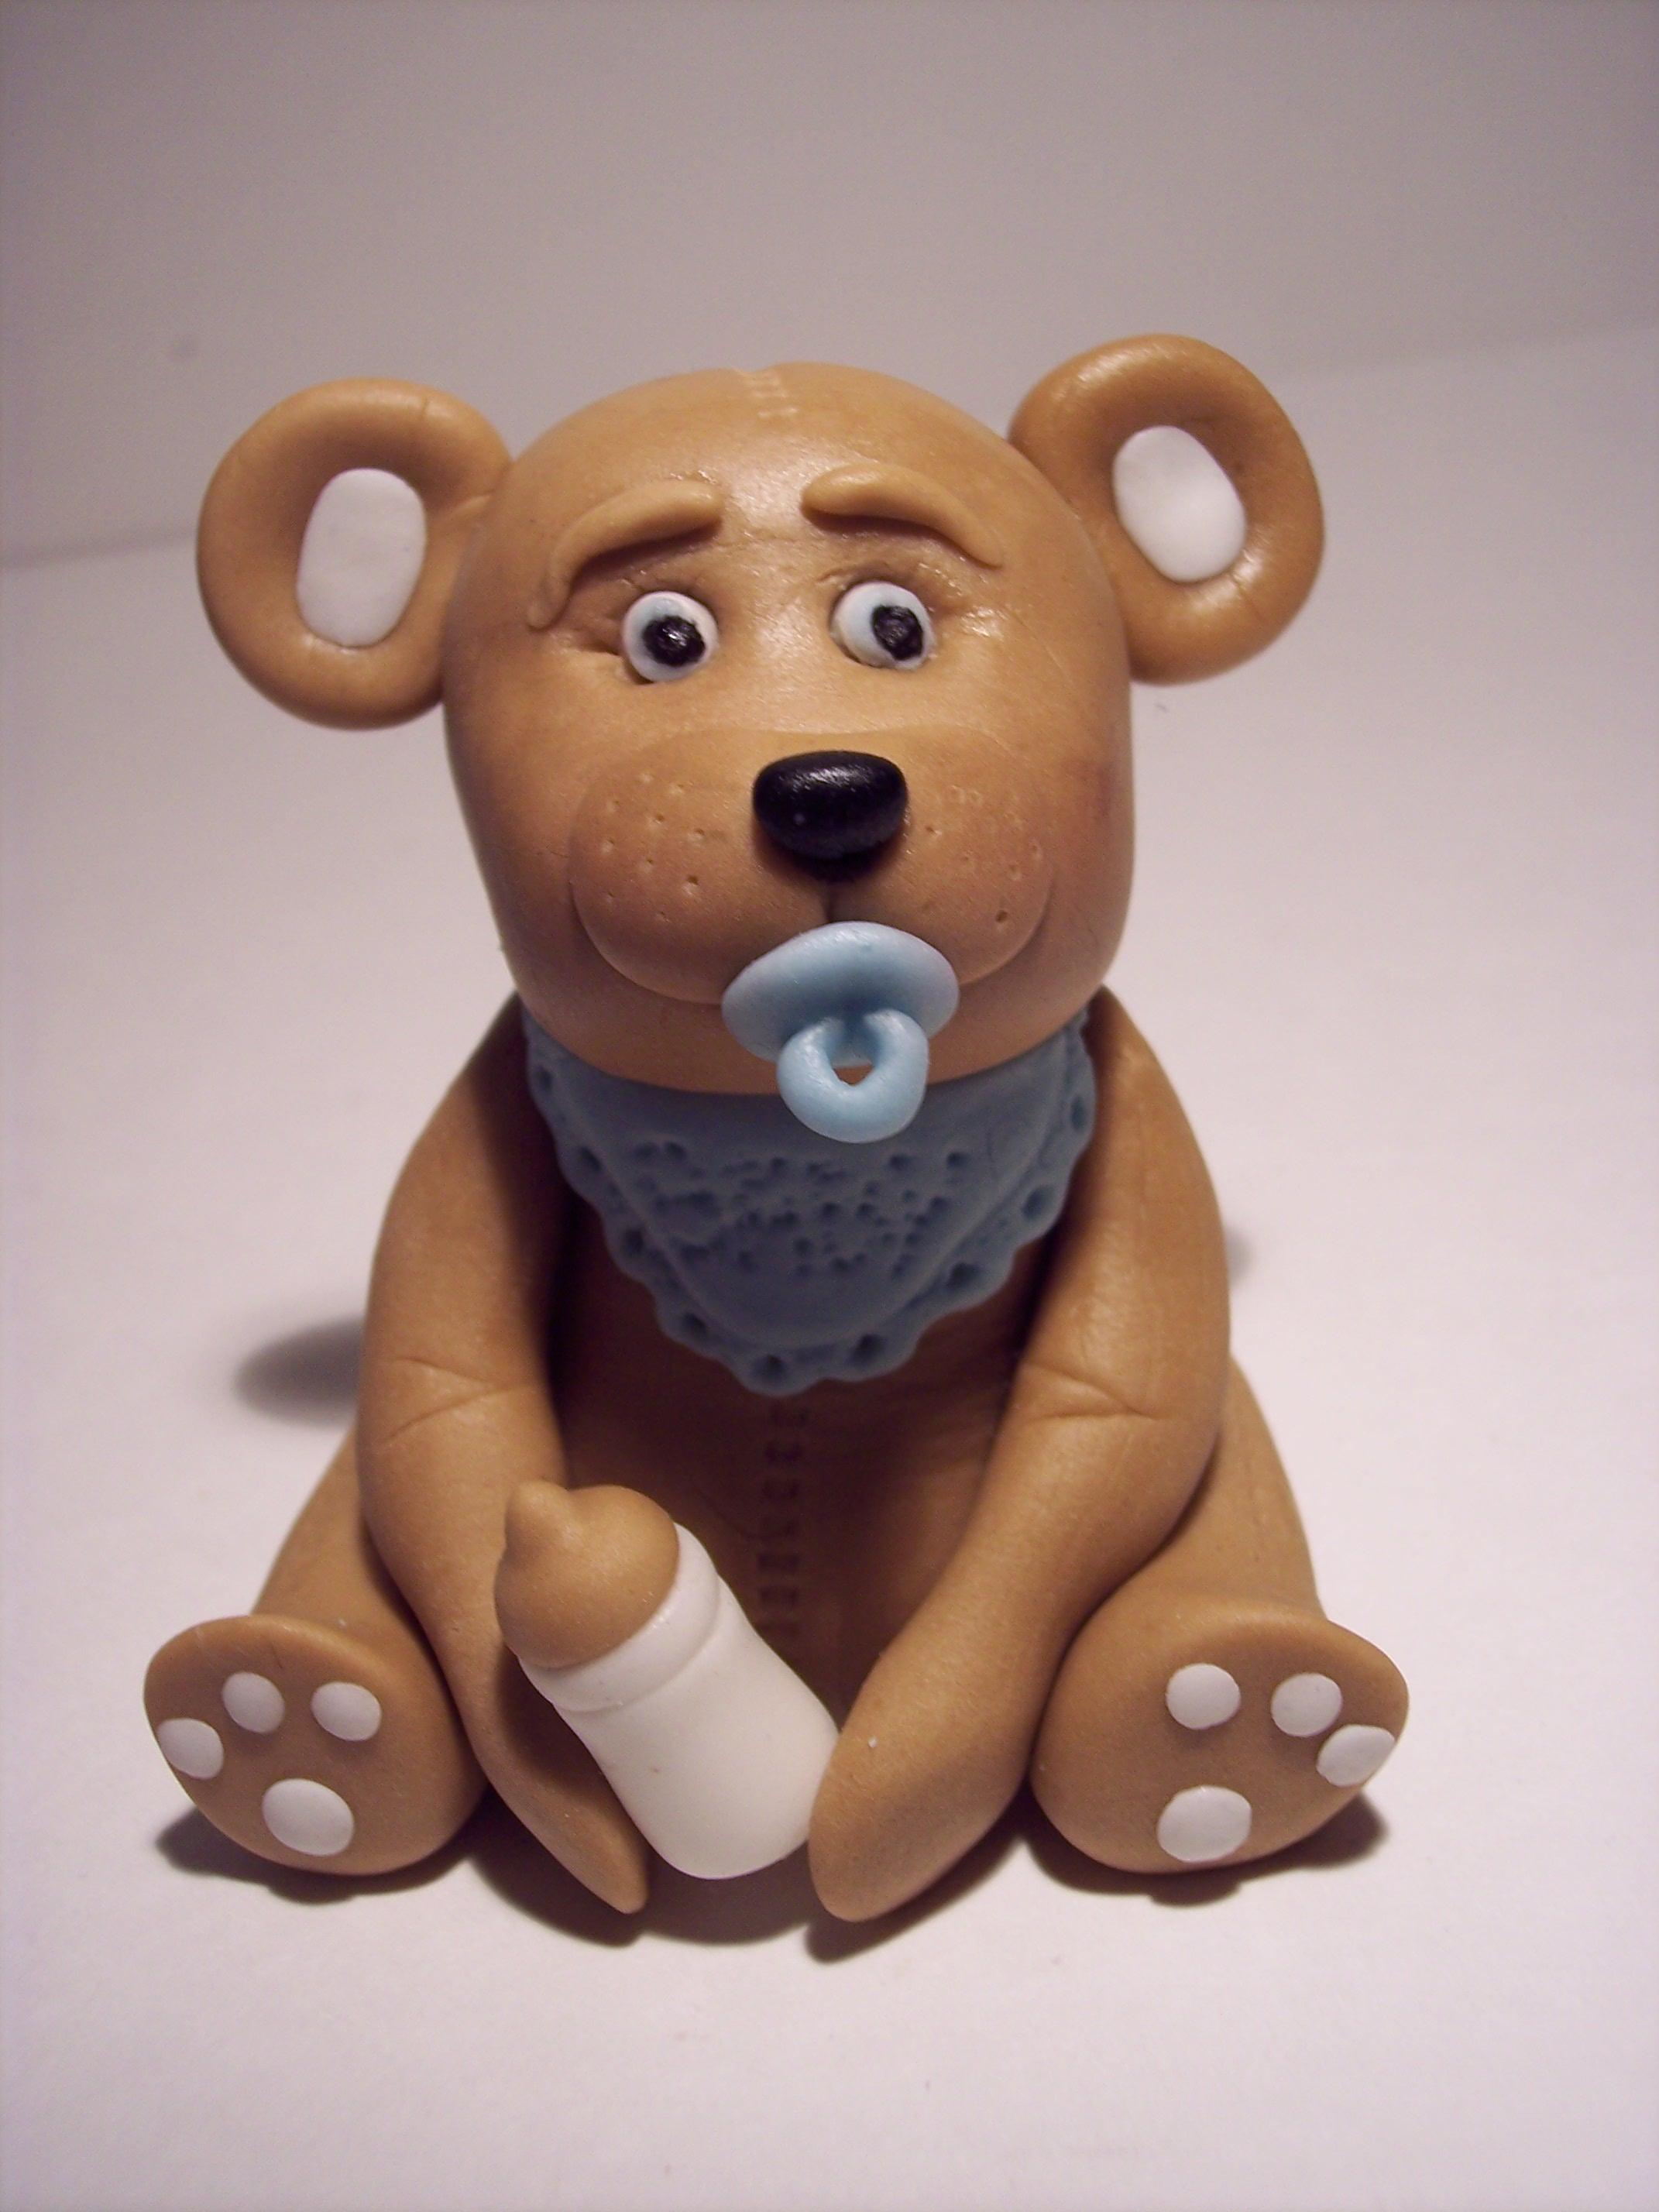 Cake Decorating Animal Figures Fondant Teddy Bear The Sugar Lane